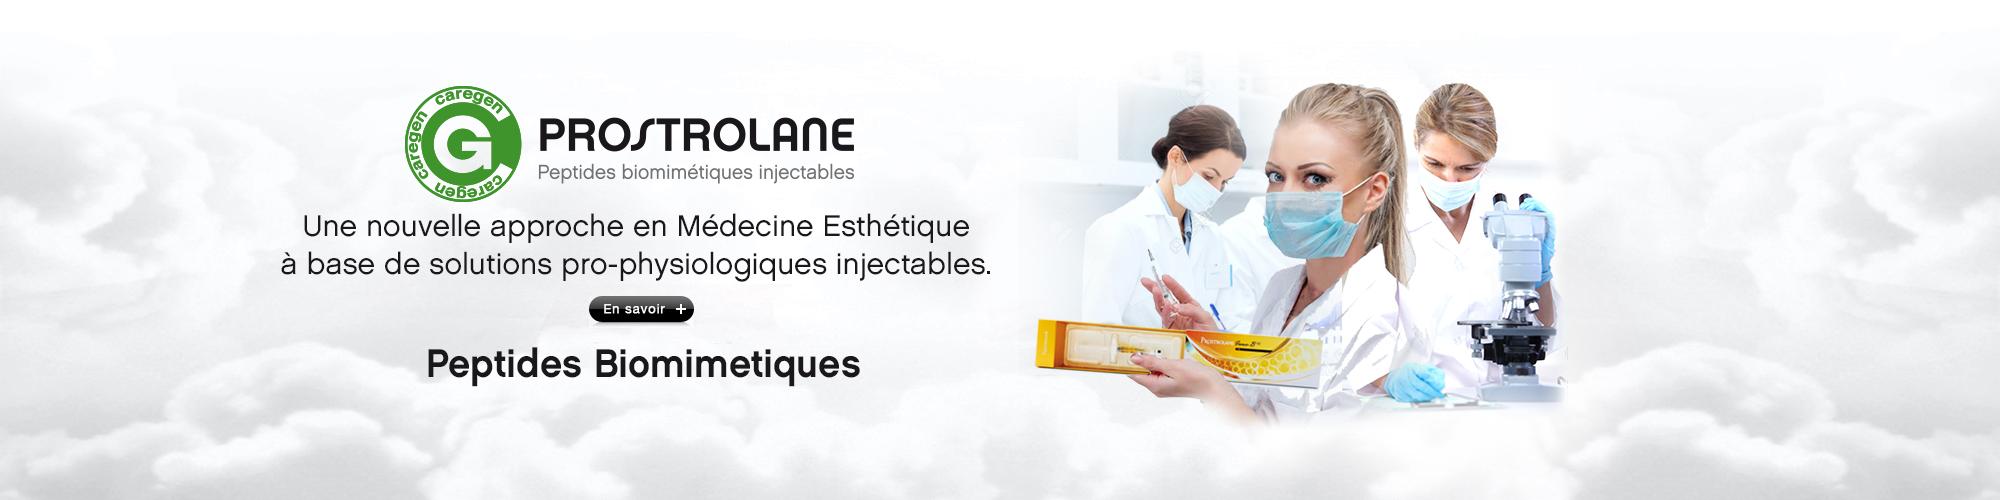 https://www.capactuel.com/storage/app/media/Carousel/accueil/prostrolane.jpg